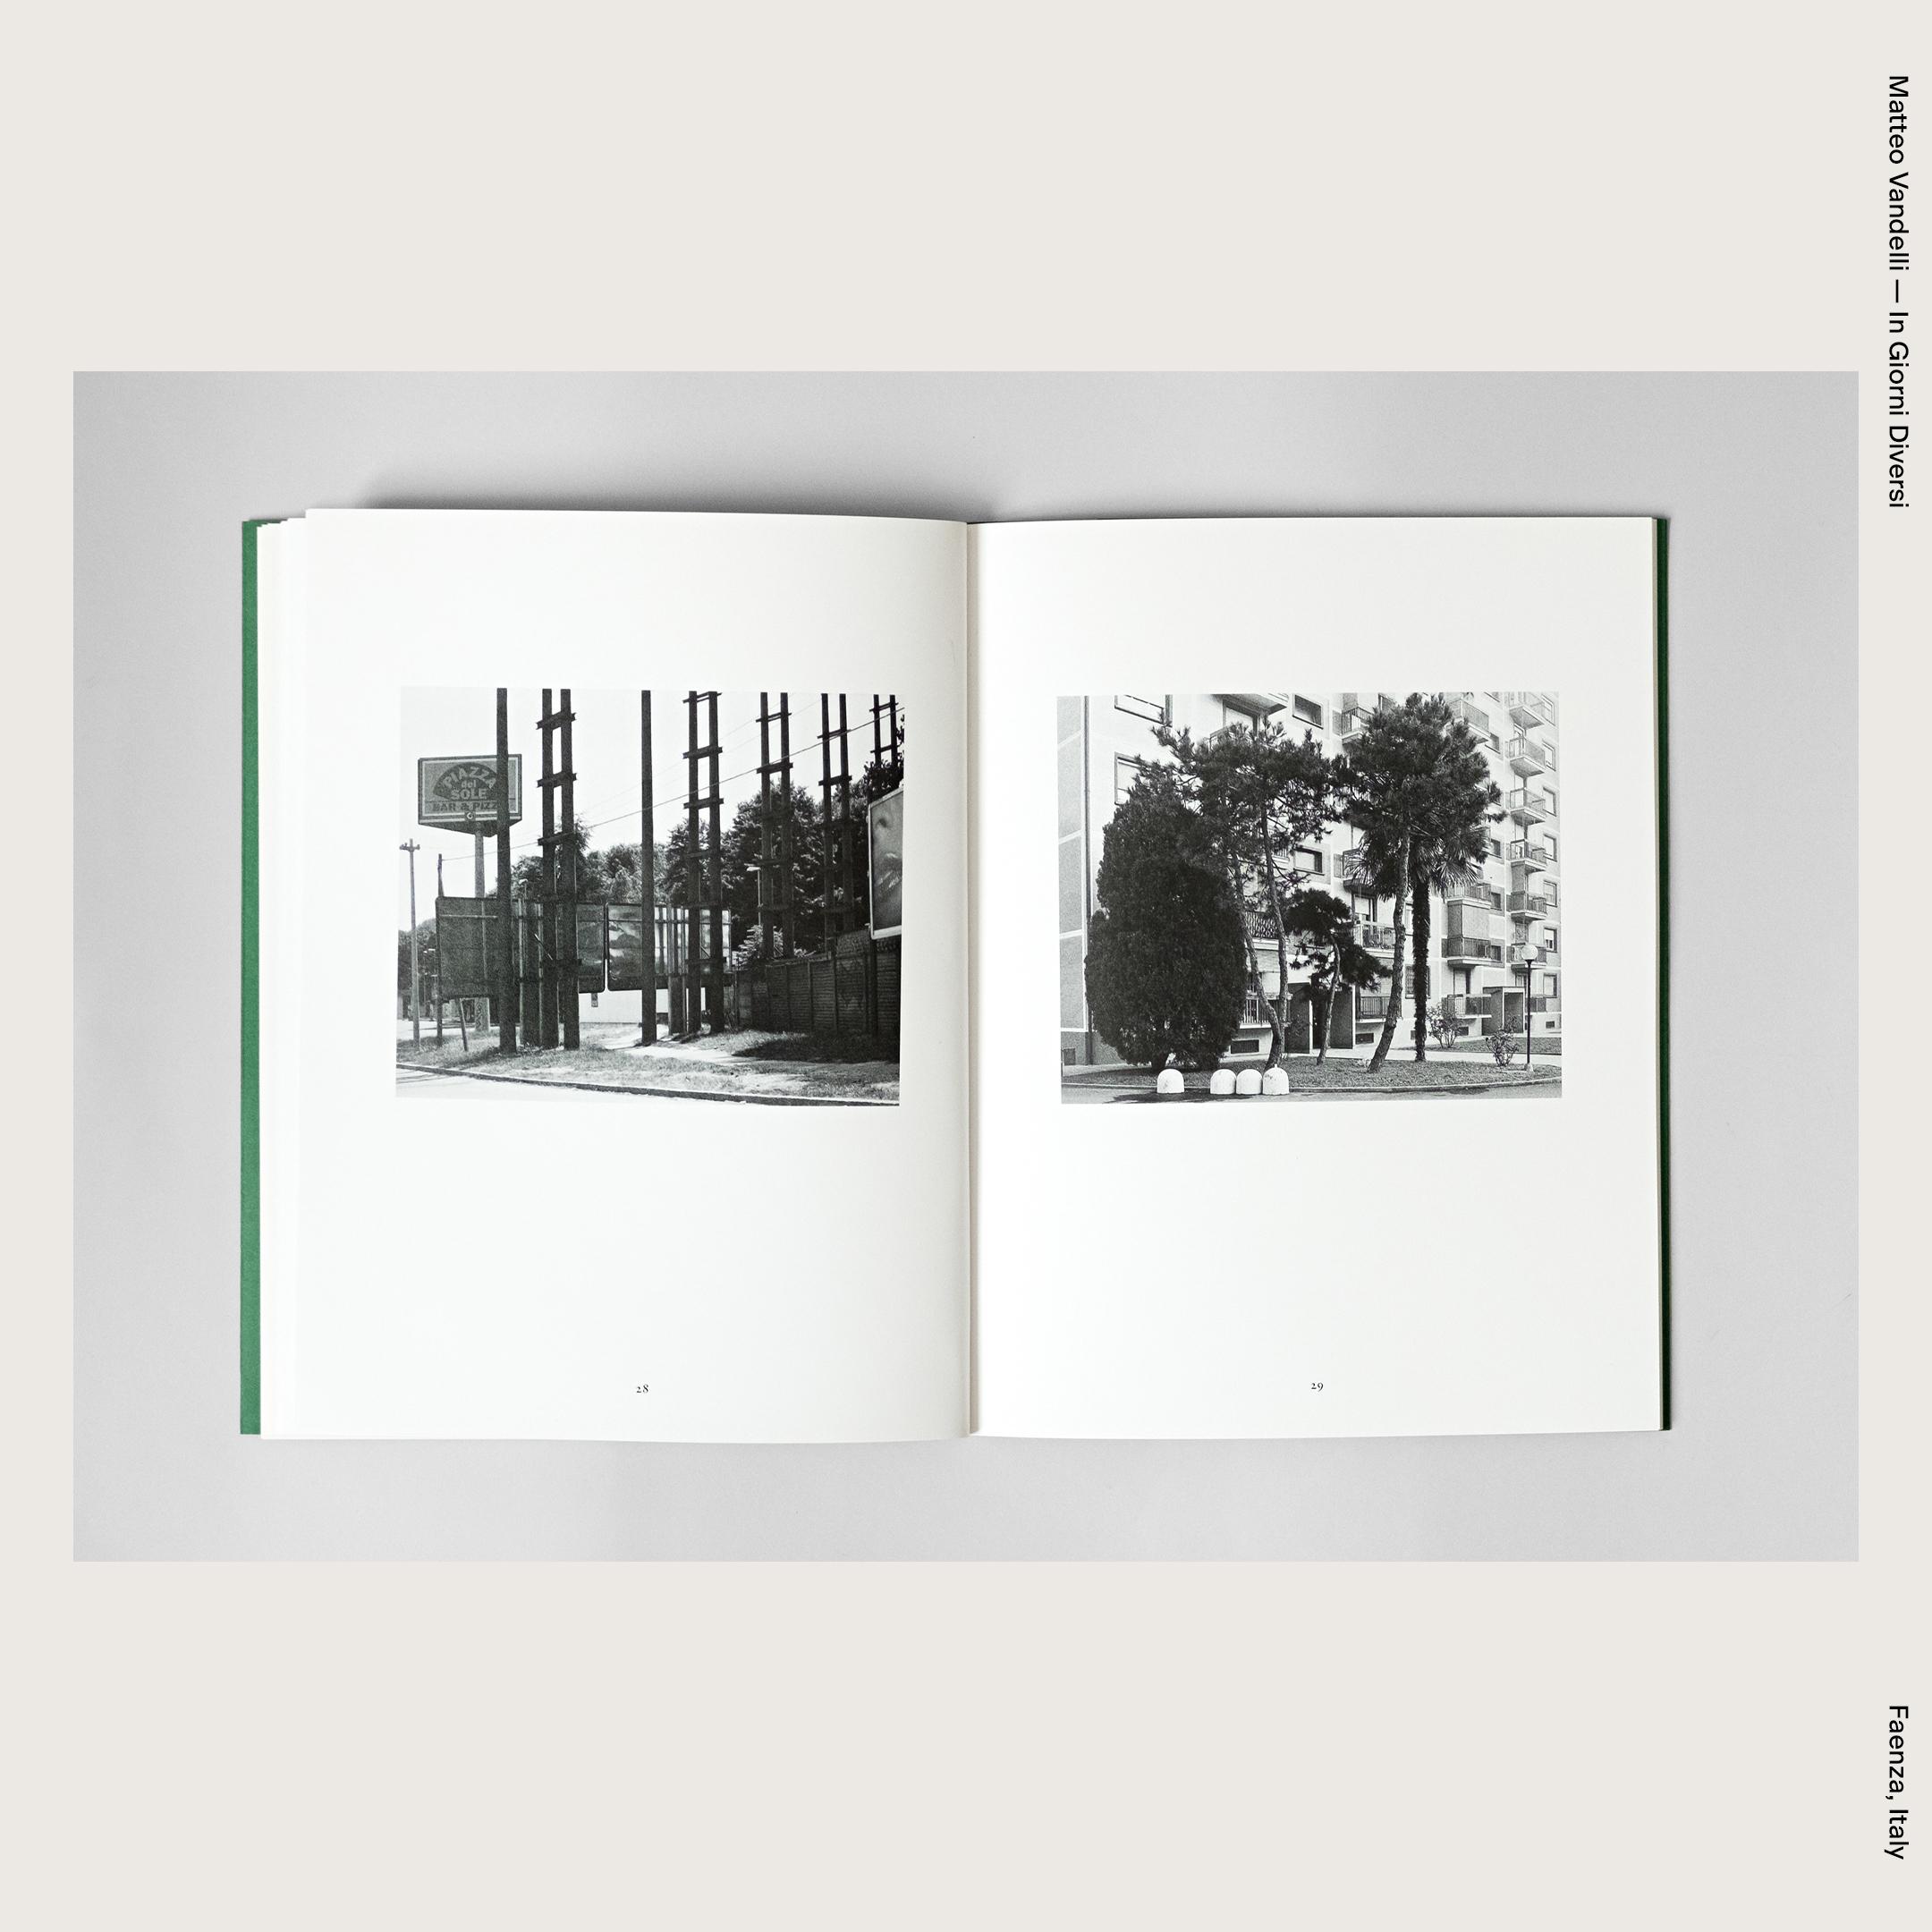 Matteo Vandelli — In Giorni Diversi